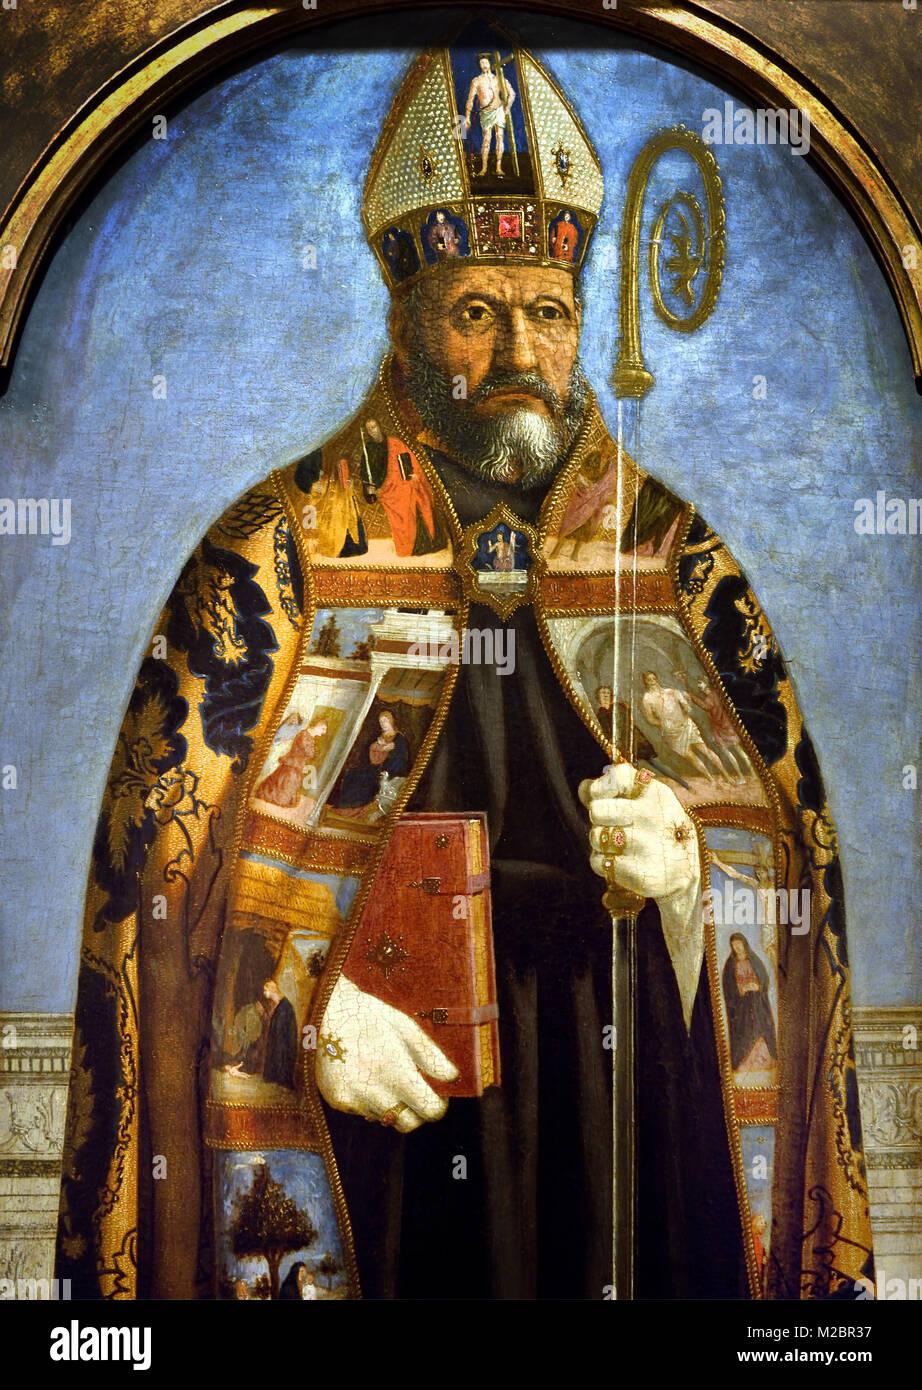 Saint Augustine 1460 Piero della Francesca 1415/20 - 1492 Italy Italian - Stock Image